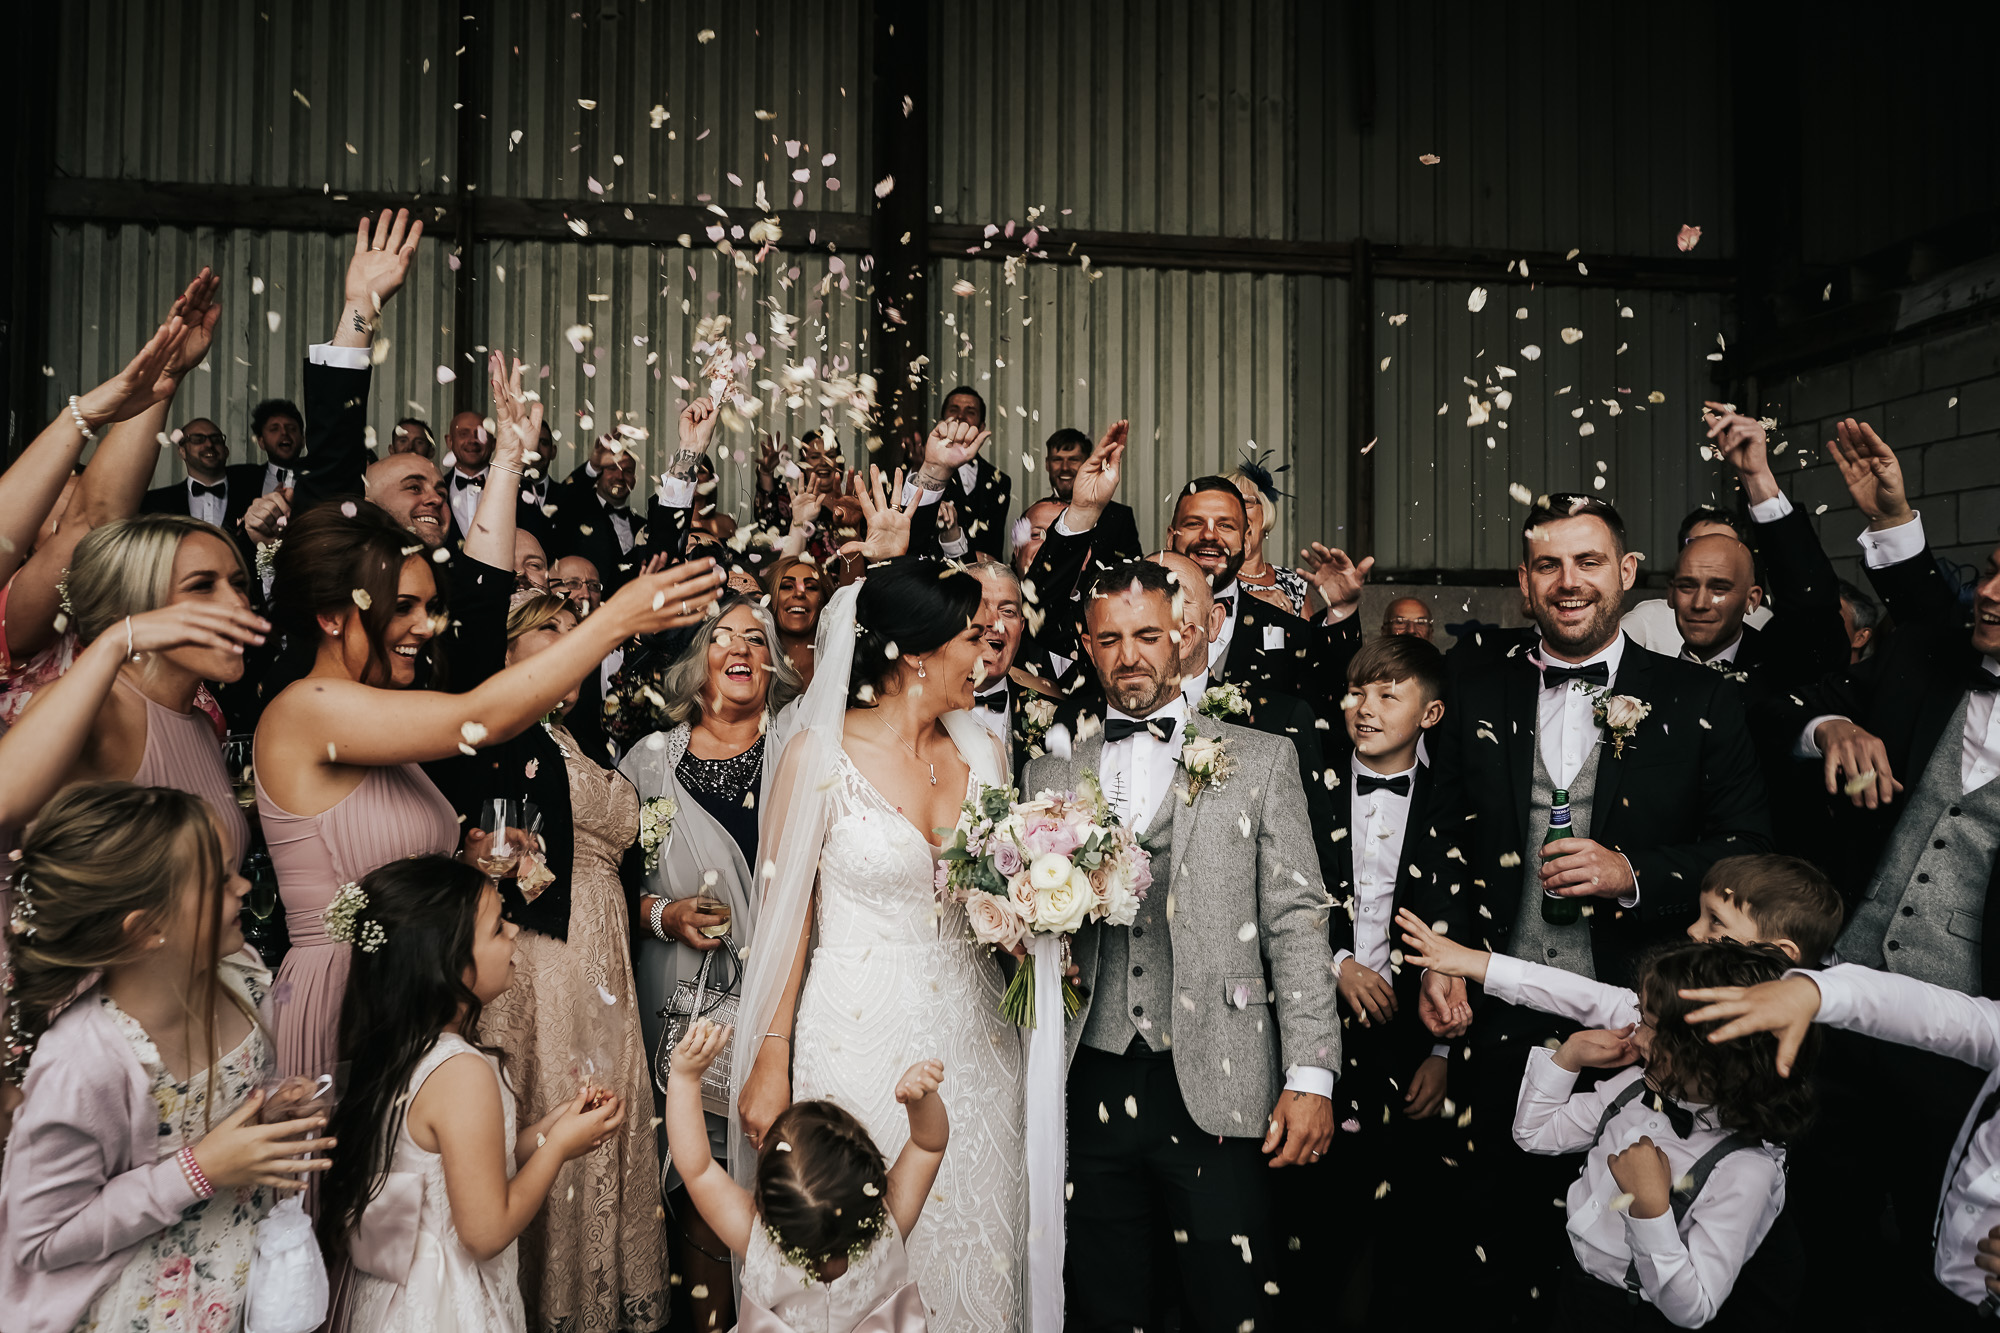 The Hayloft Wedding Photography Cheshire wedding photographer (32 of 52).jpg